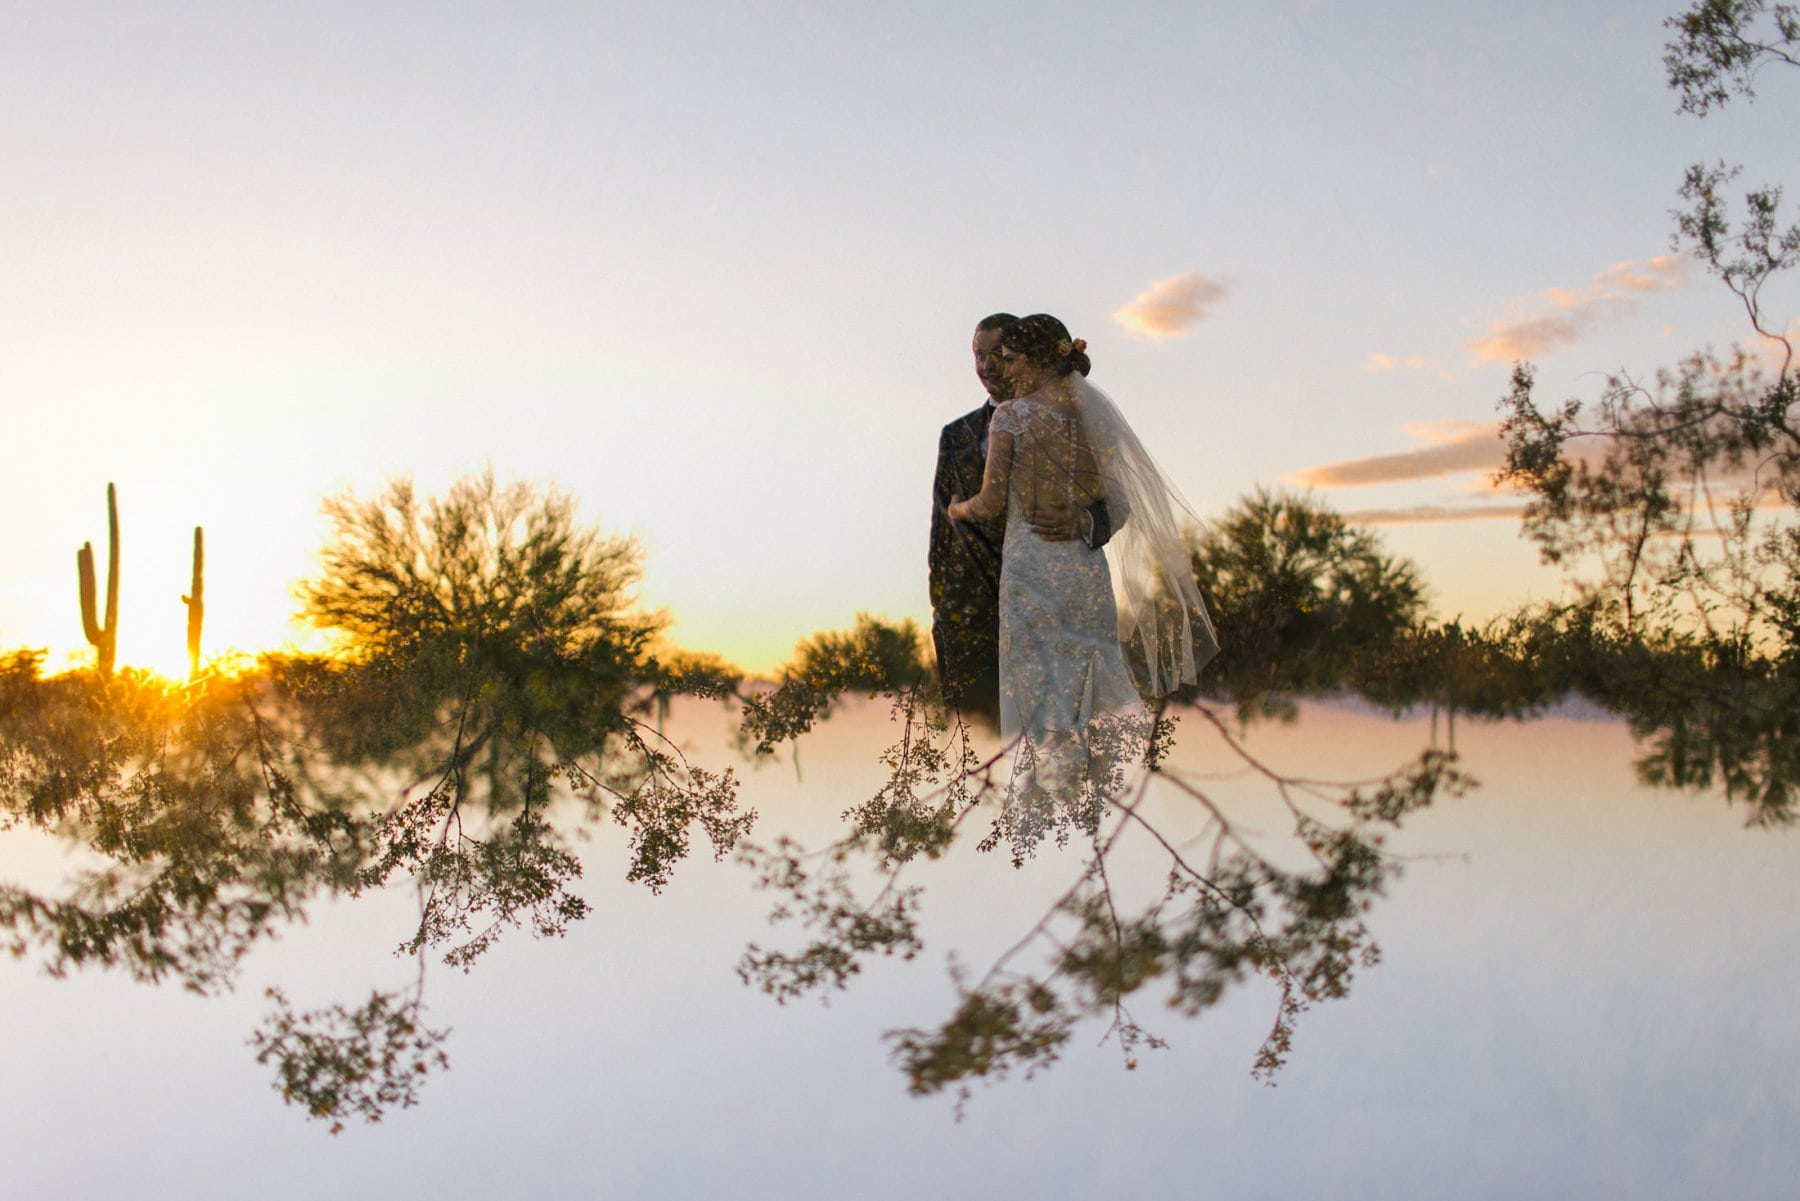 artistic creative bride & groom photos Arizona double exposure at sunset